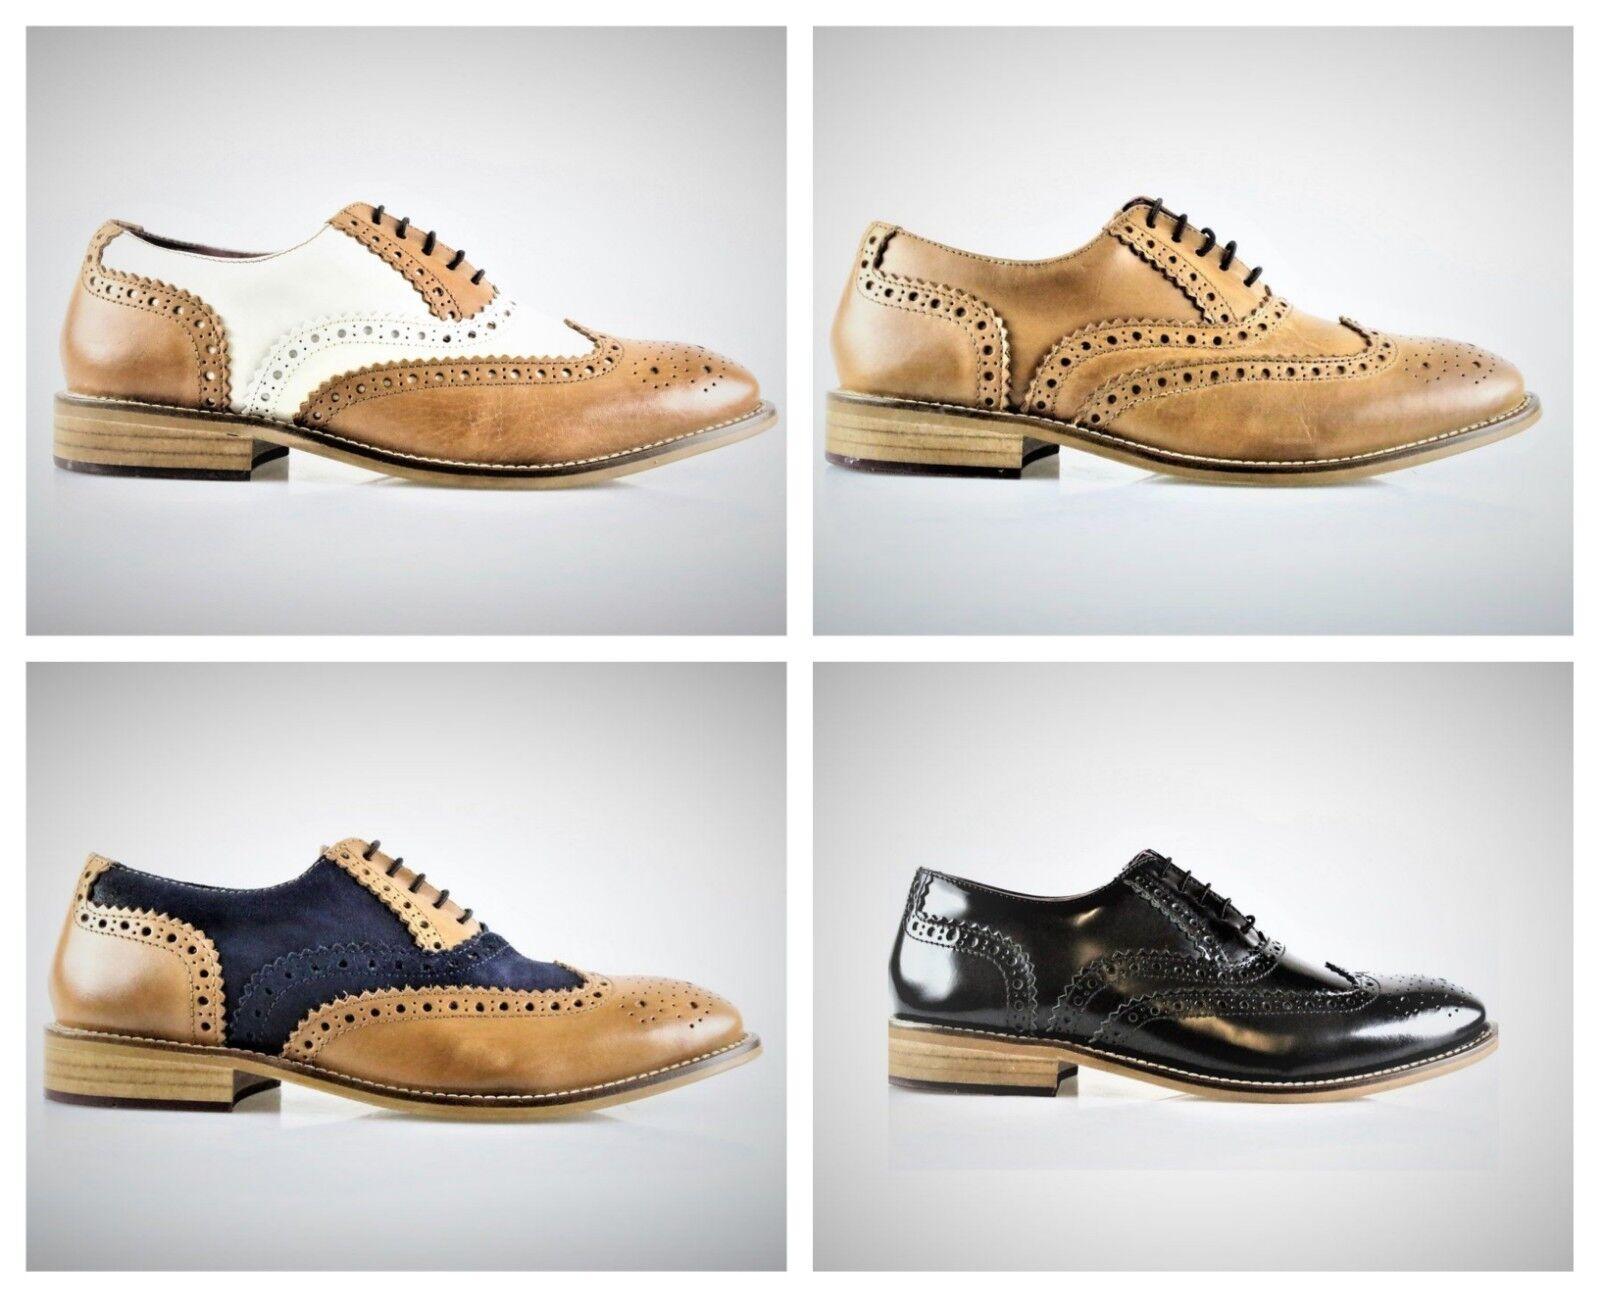 Boys London Brogues Gatsby Leather Formal Smart Brogue schuhe Junior Größes 3-6